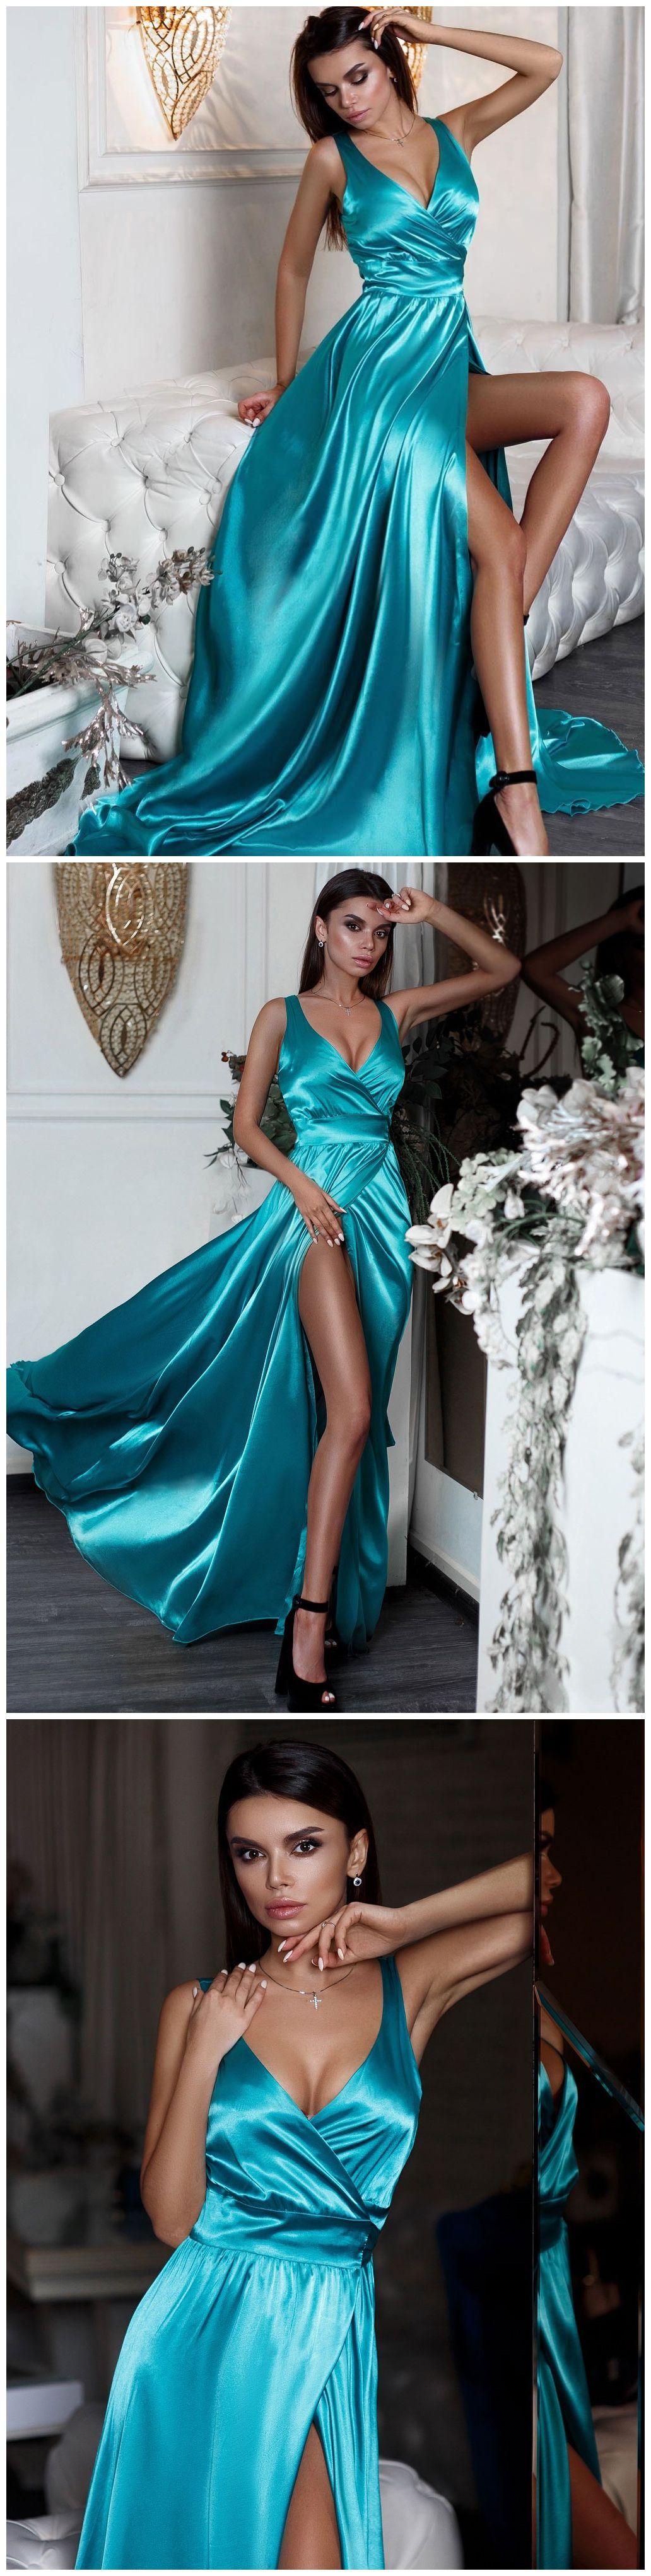 Sexy split long prom dresses turquoise vneck formal evening dress